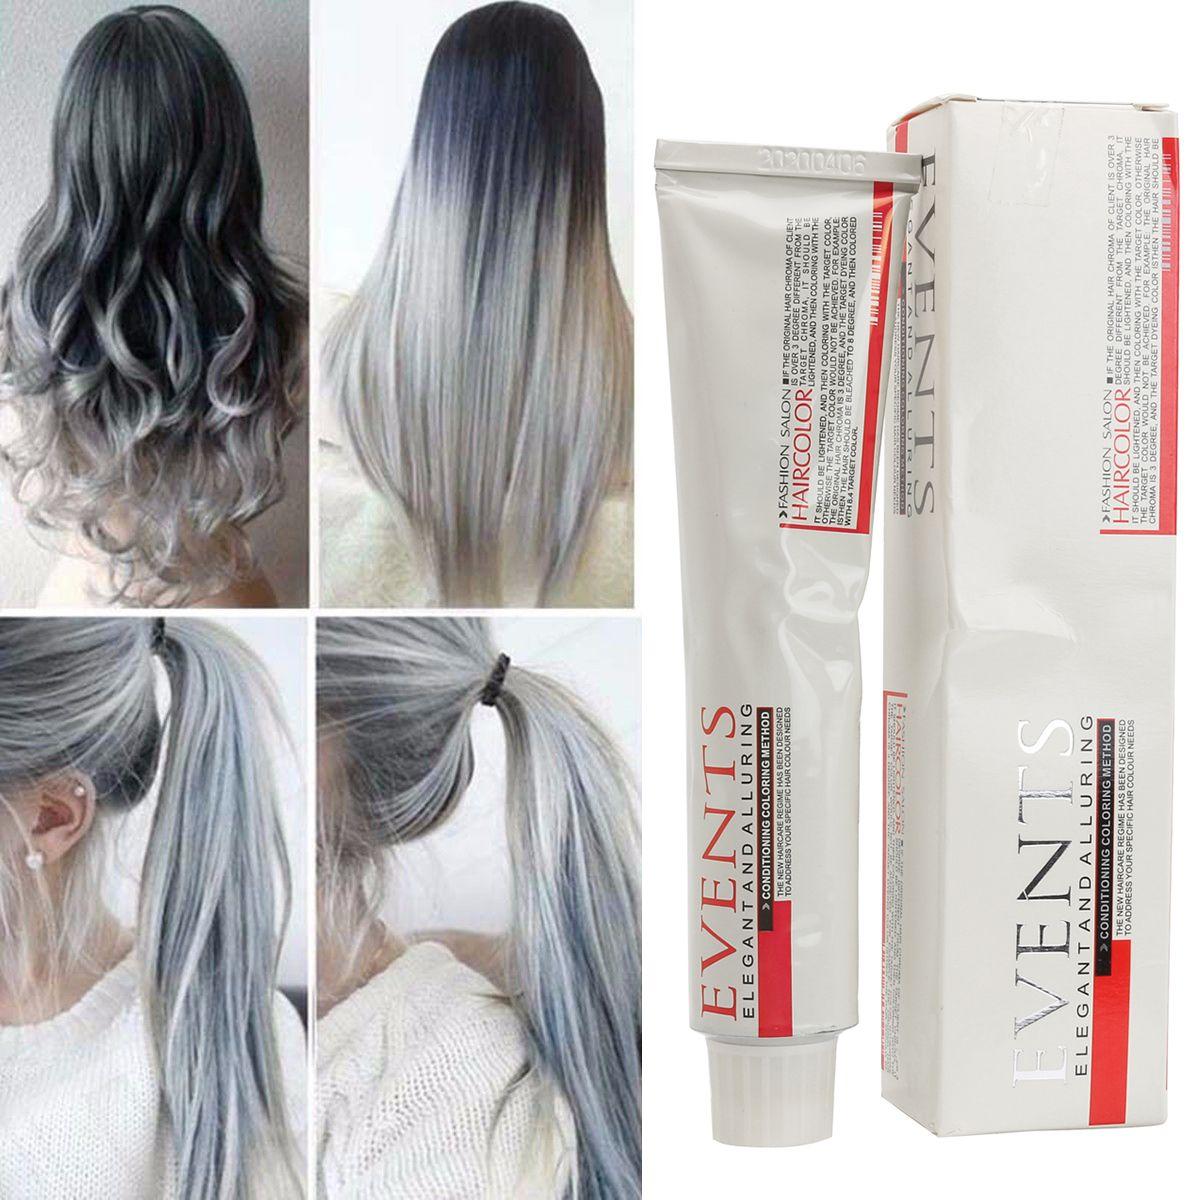 Light Gray Hair Dye Color Cream Fashion Styling Diy For Men Women Is